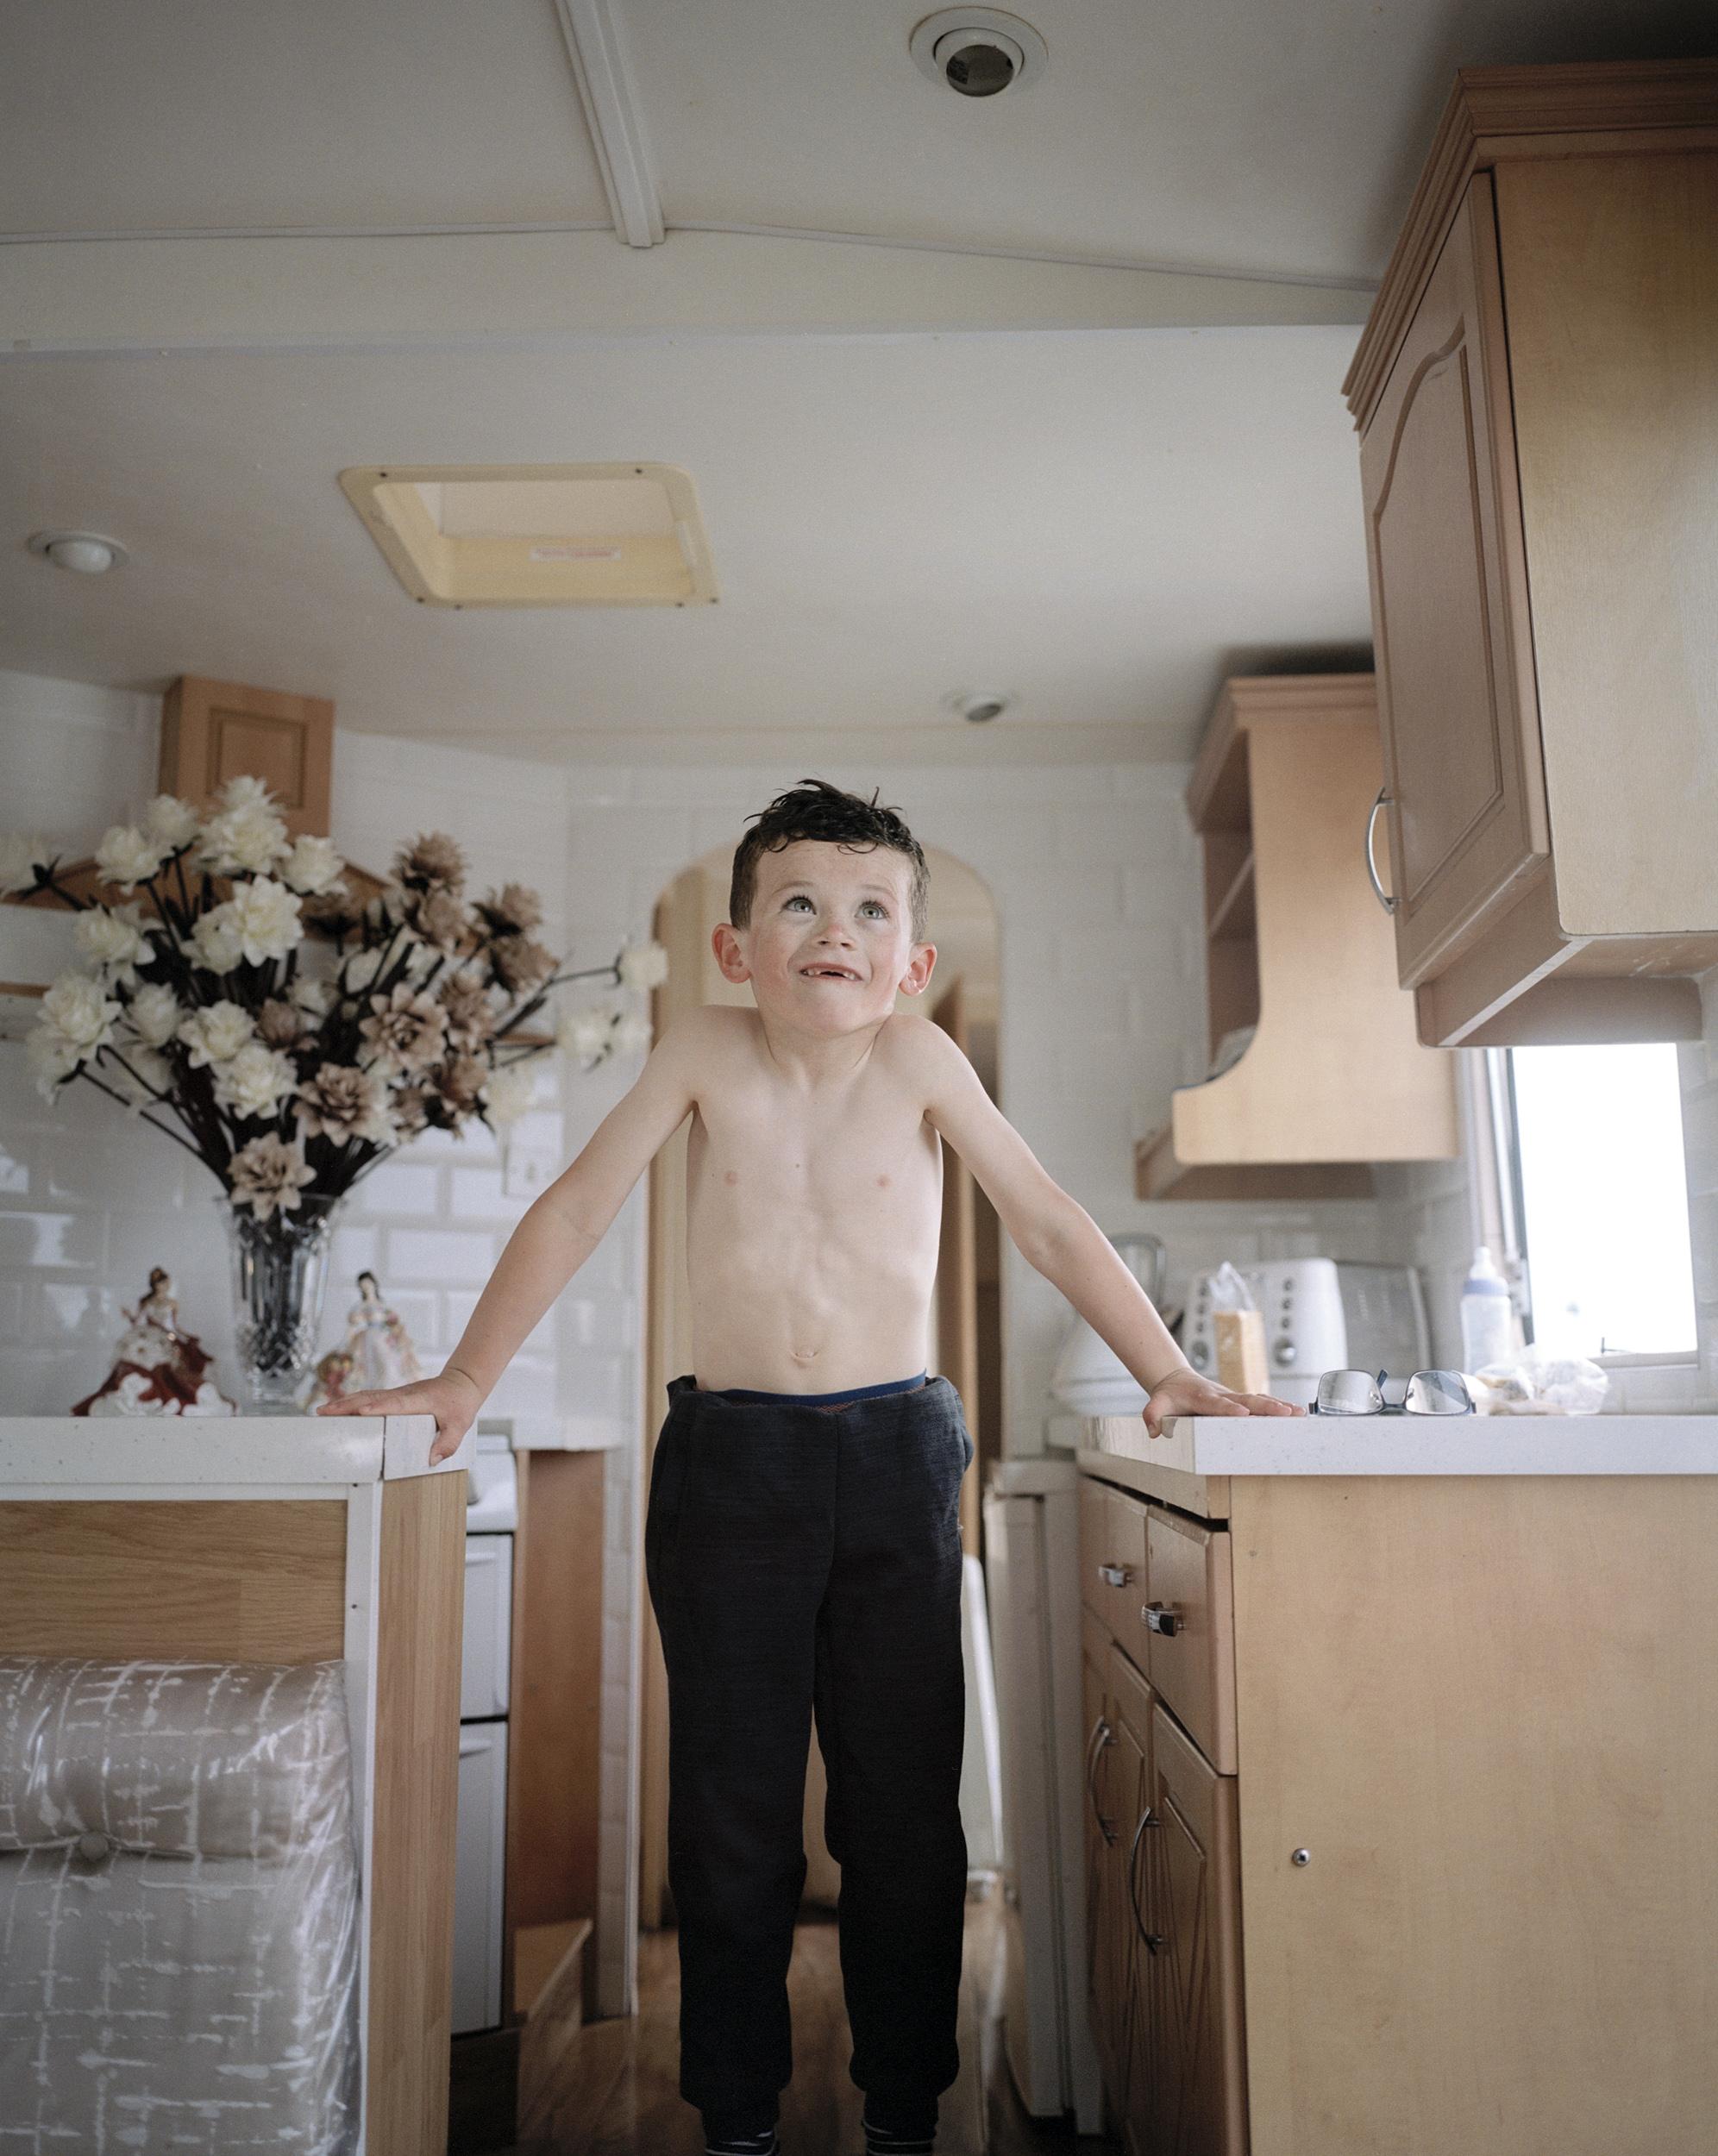 Tamara_Eckhardt_The_Children_of_Carrowbrowne_06